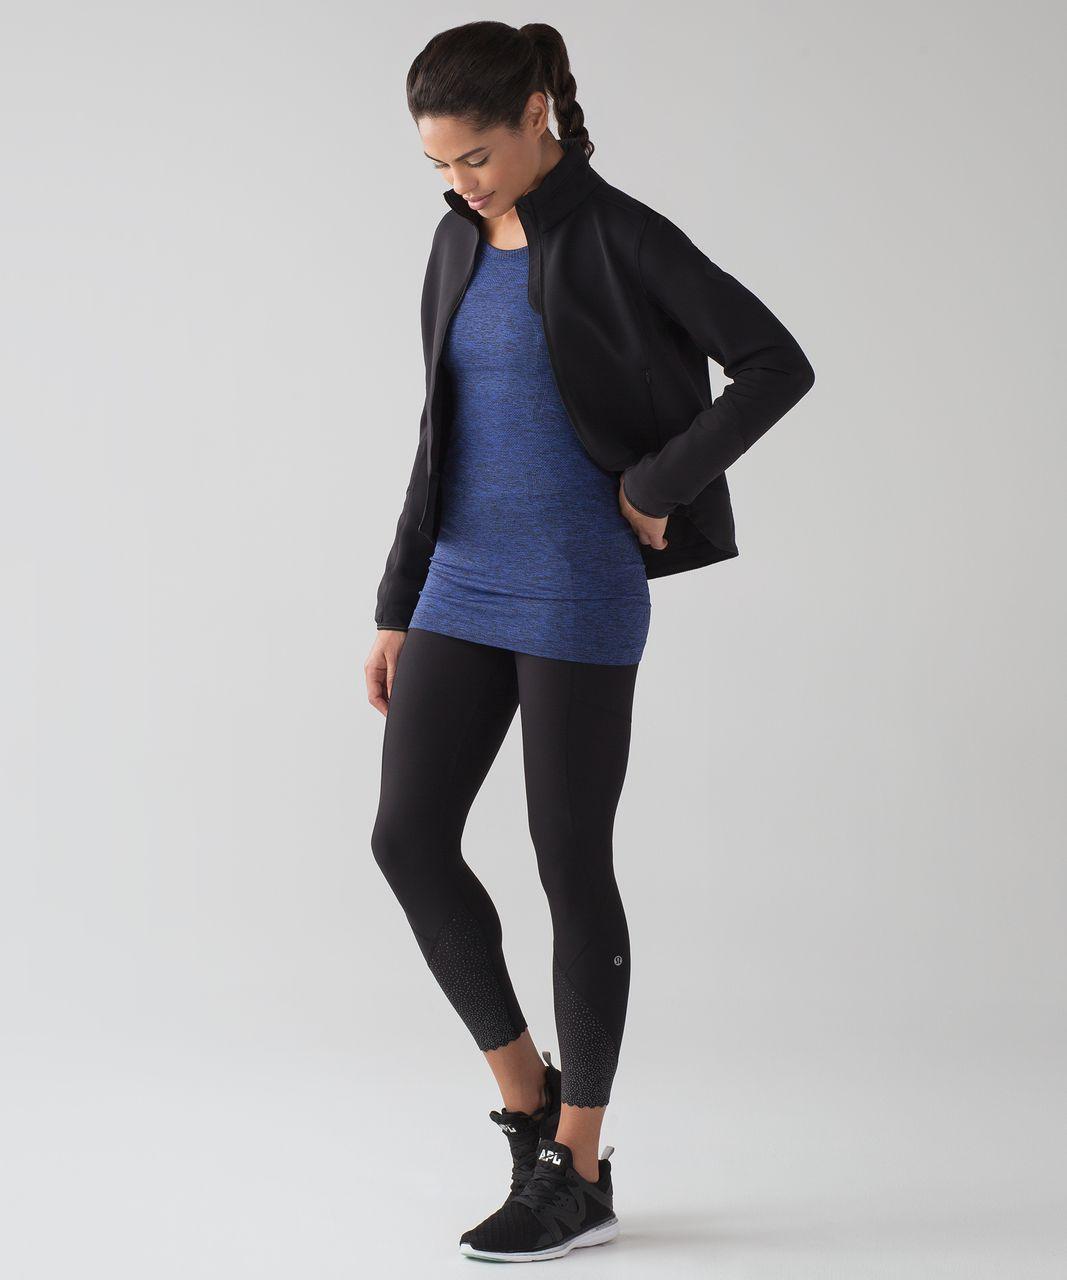 Lululemon Swiftly Tech Long Sleeve Crew - Blazer Blue / Black